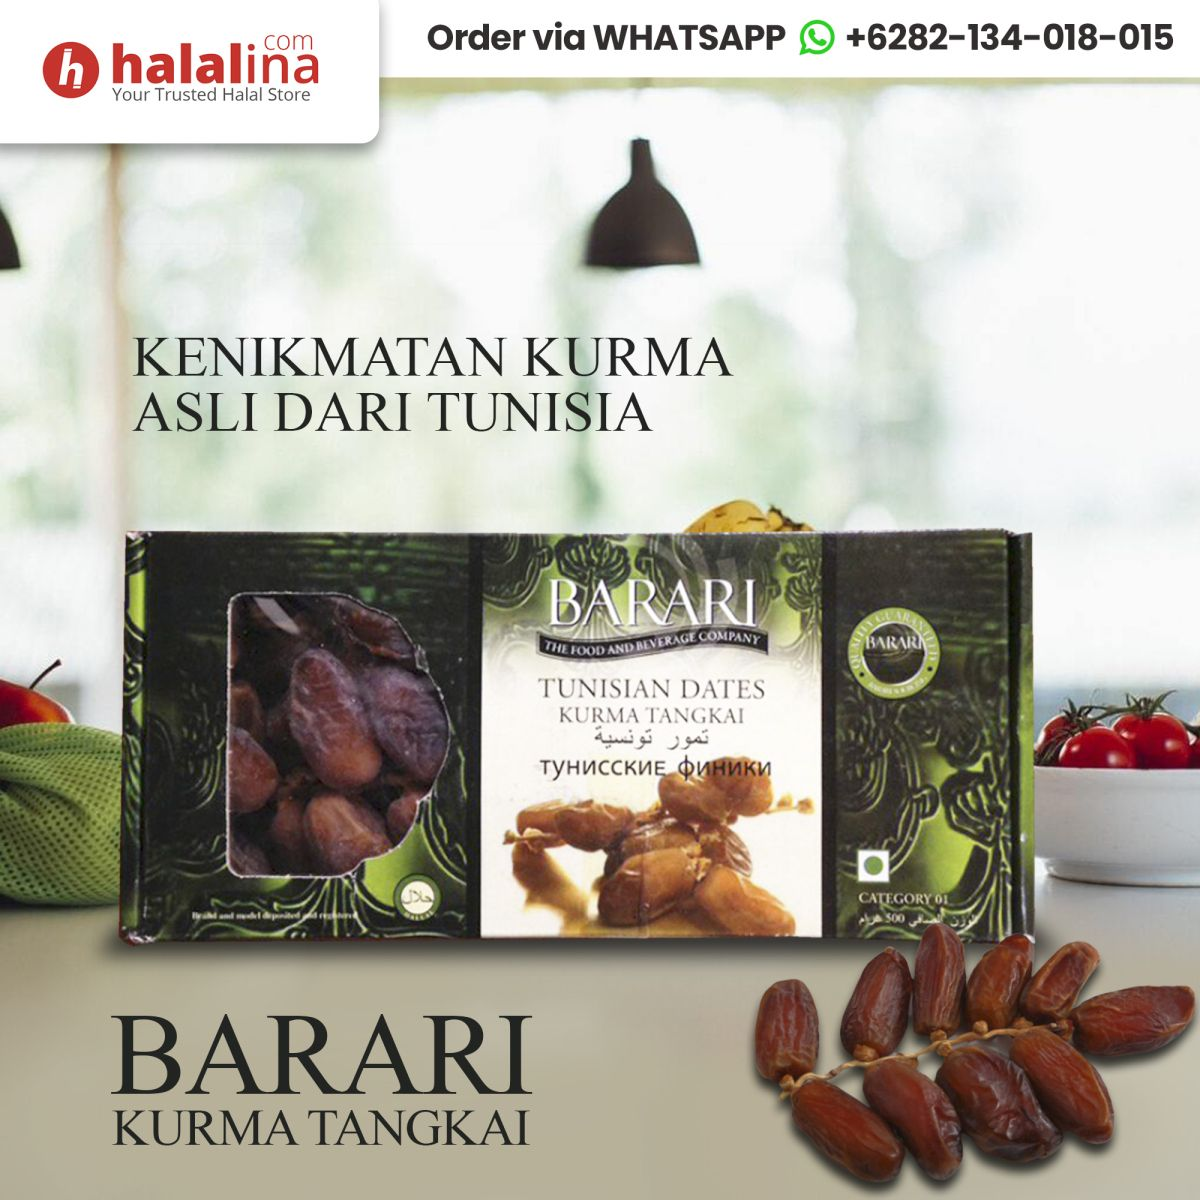 Phone 62 821 3401 8015 Halal Food In Tokyo In Japan In 2020 Halal Recipes Halal Snacks Food